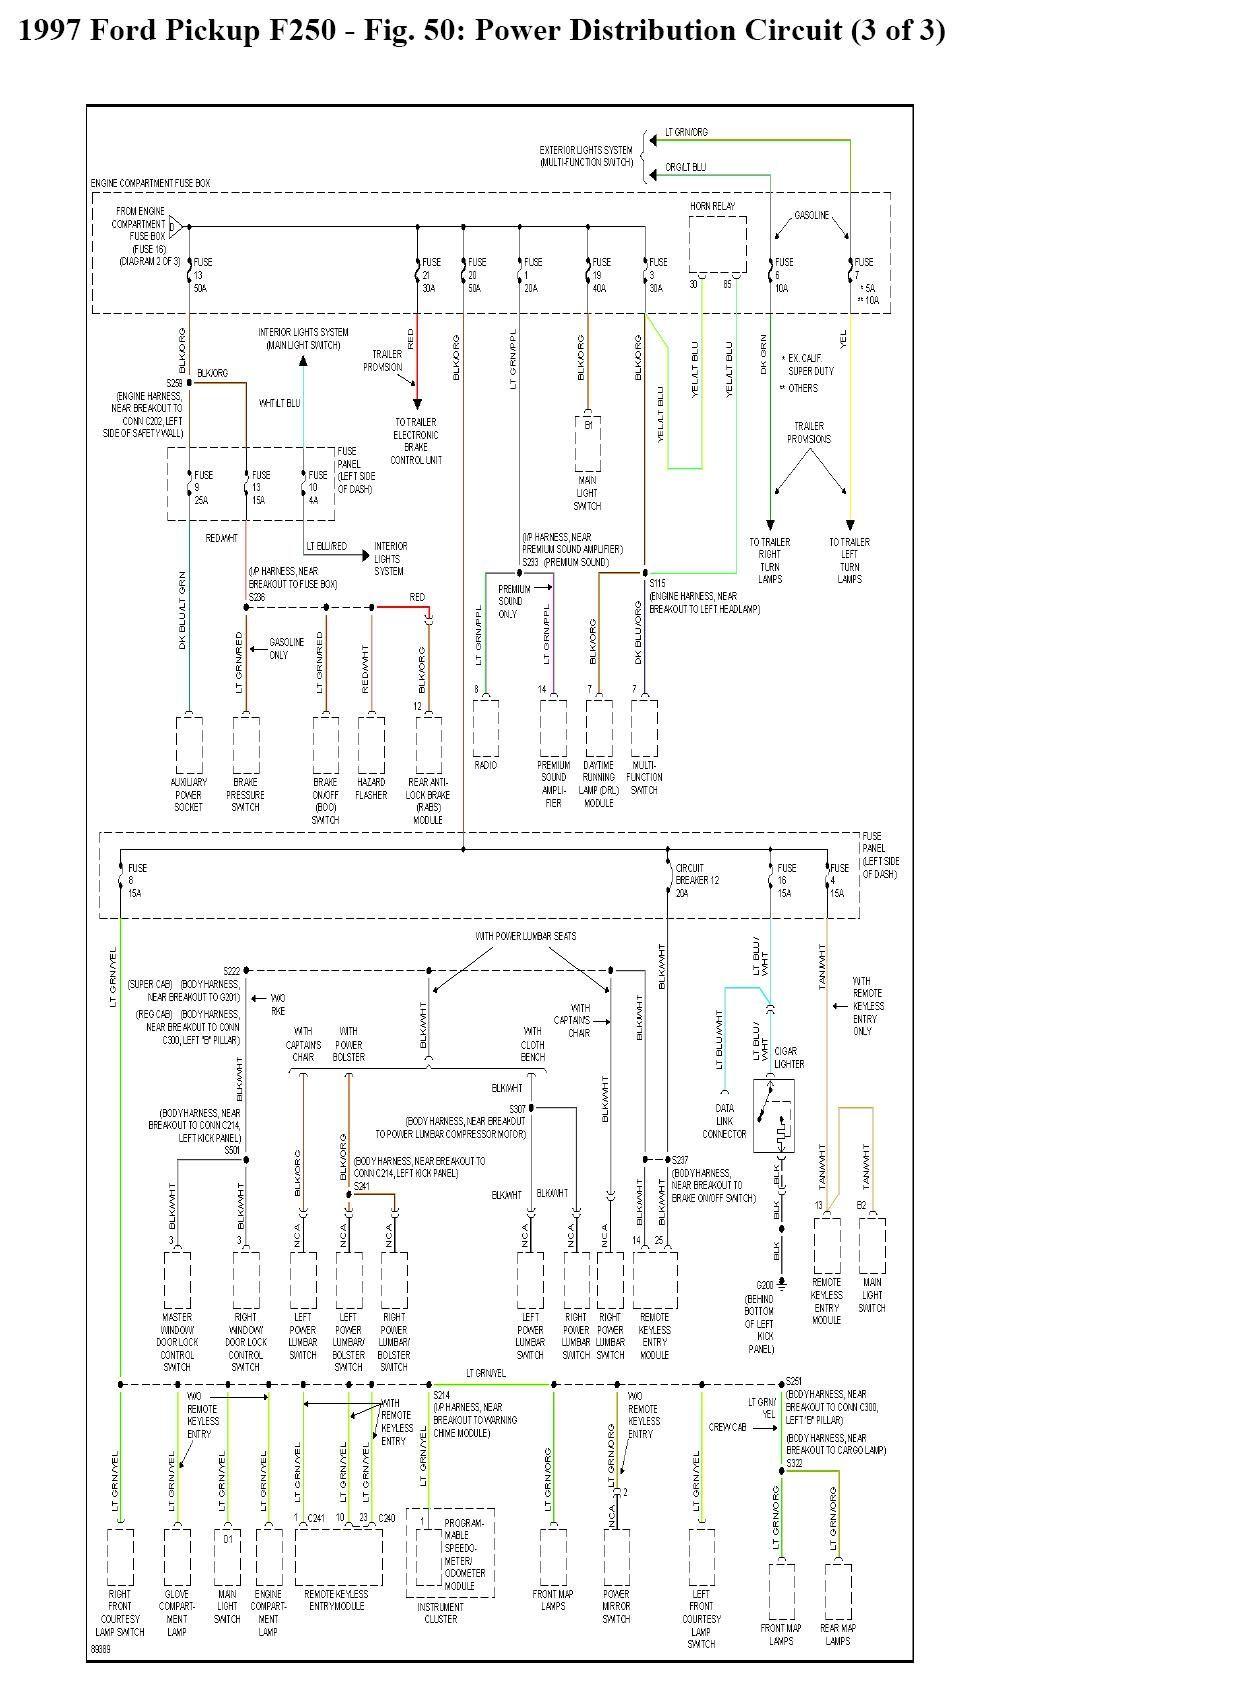 1997 7.3 Powerstroke Wiring Diagram from i.pinimg.com